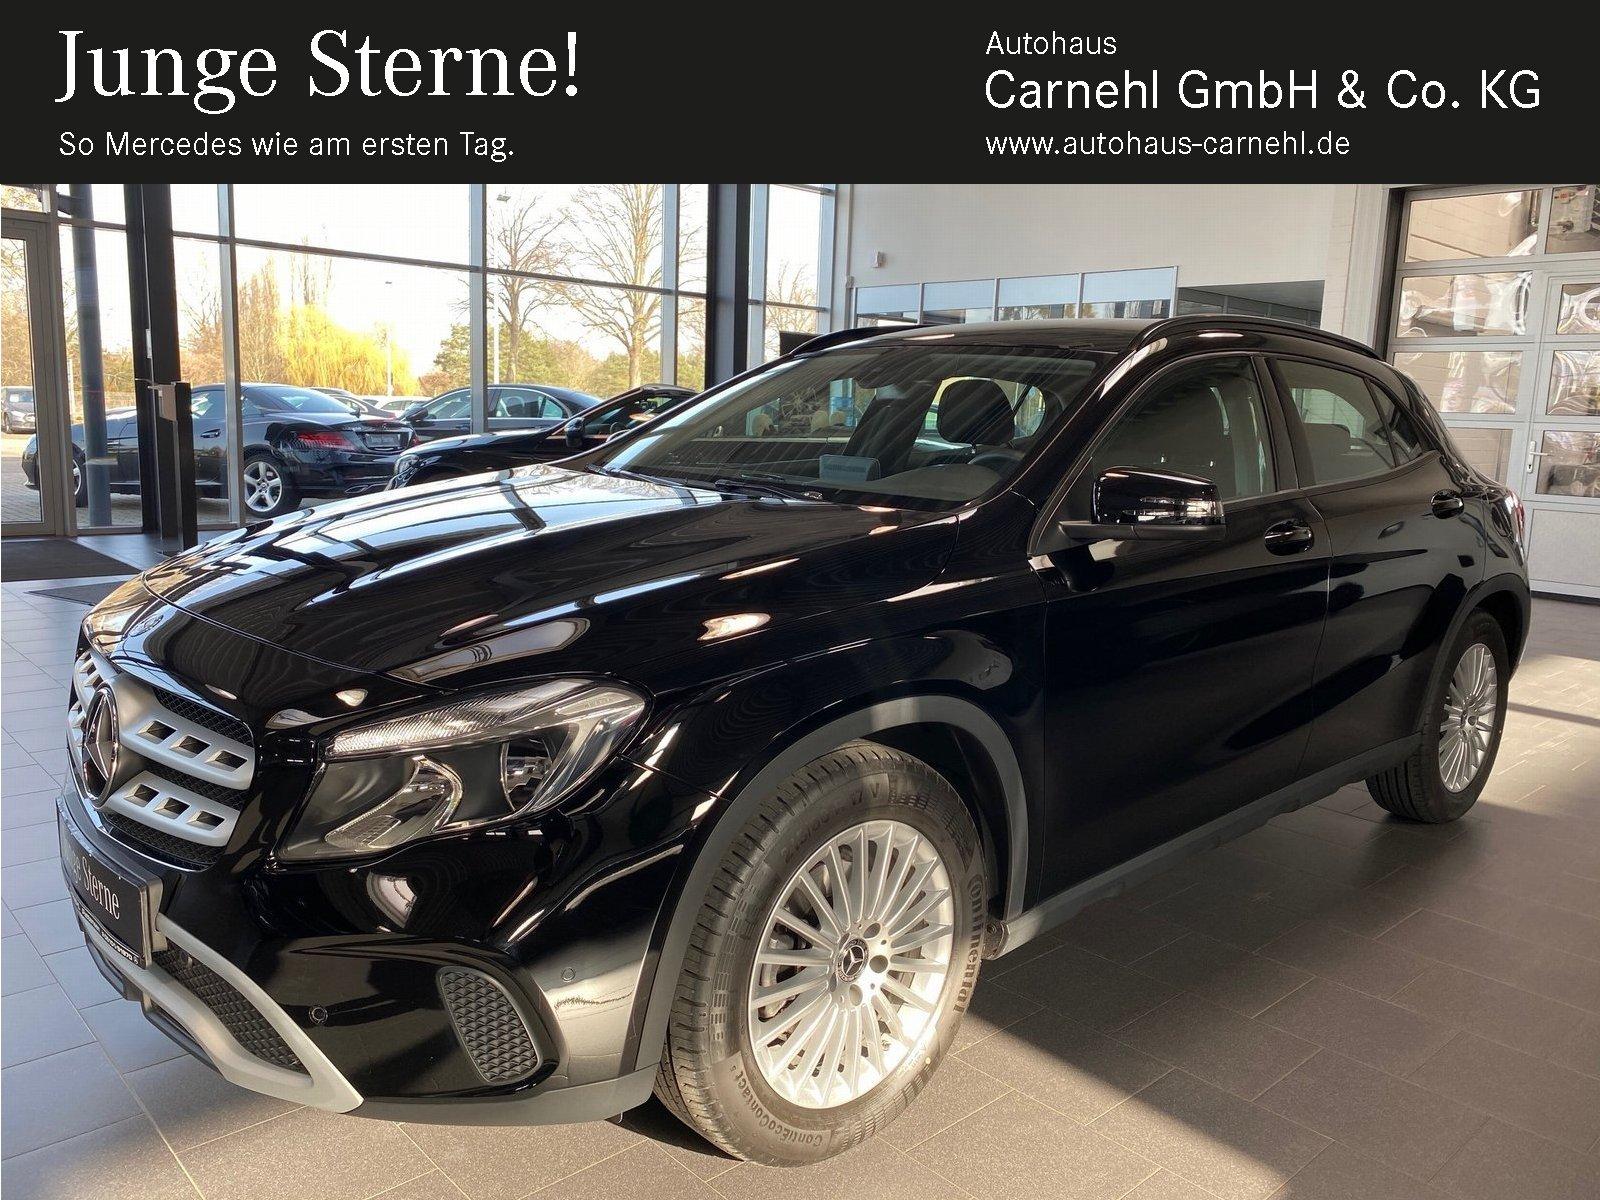 Mercedes-Benz GLA 180 Business+Navi+Tempom+SiHzg+PTS+Rükamera, Jahr 2019, Benzin